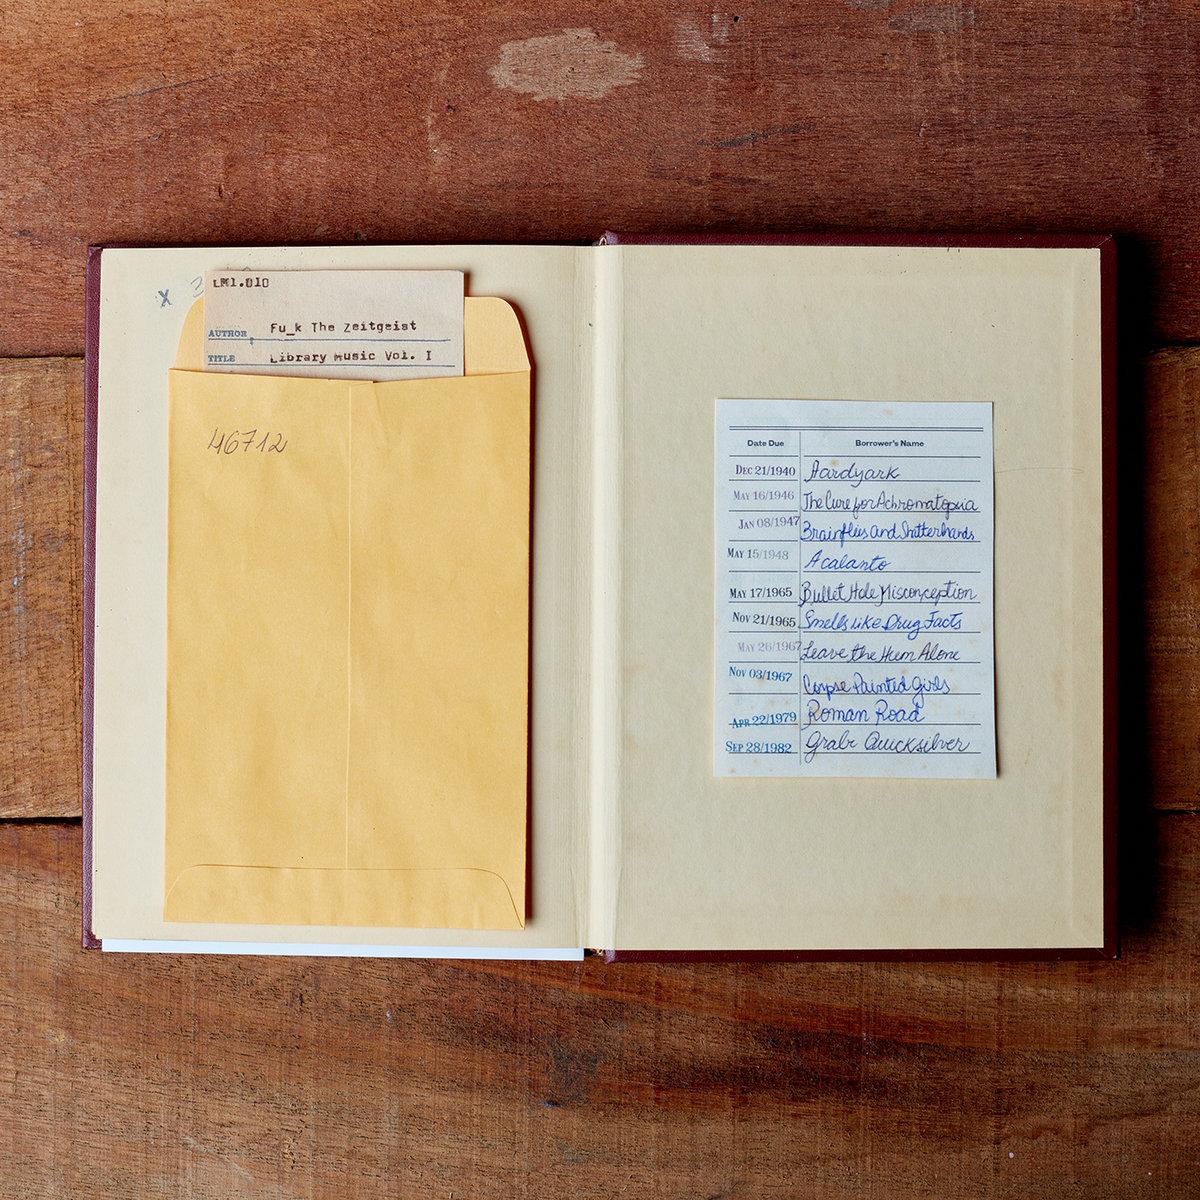 librarycover.jpg